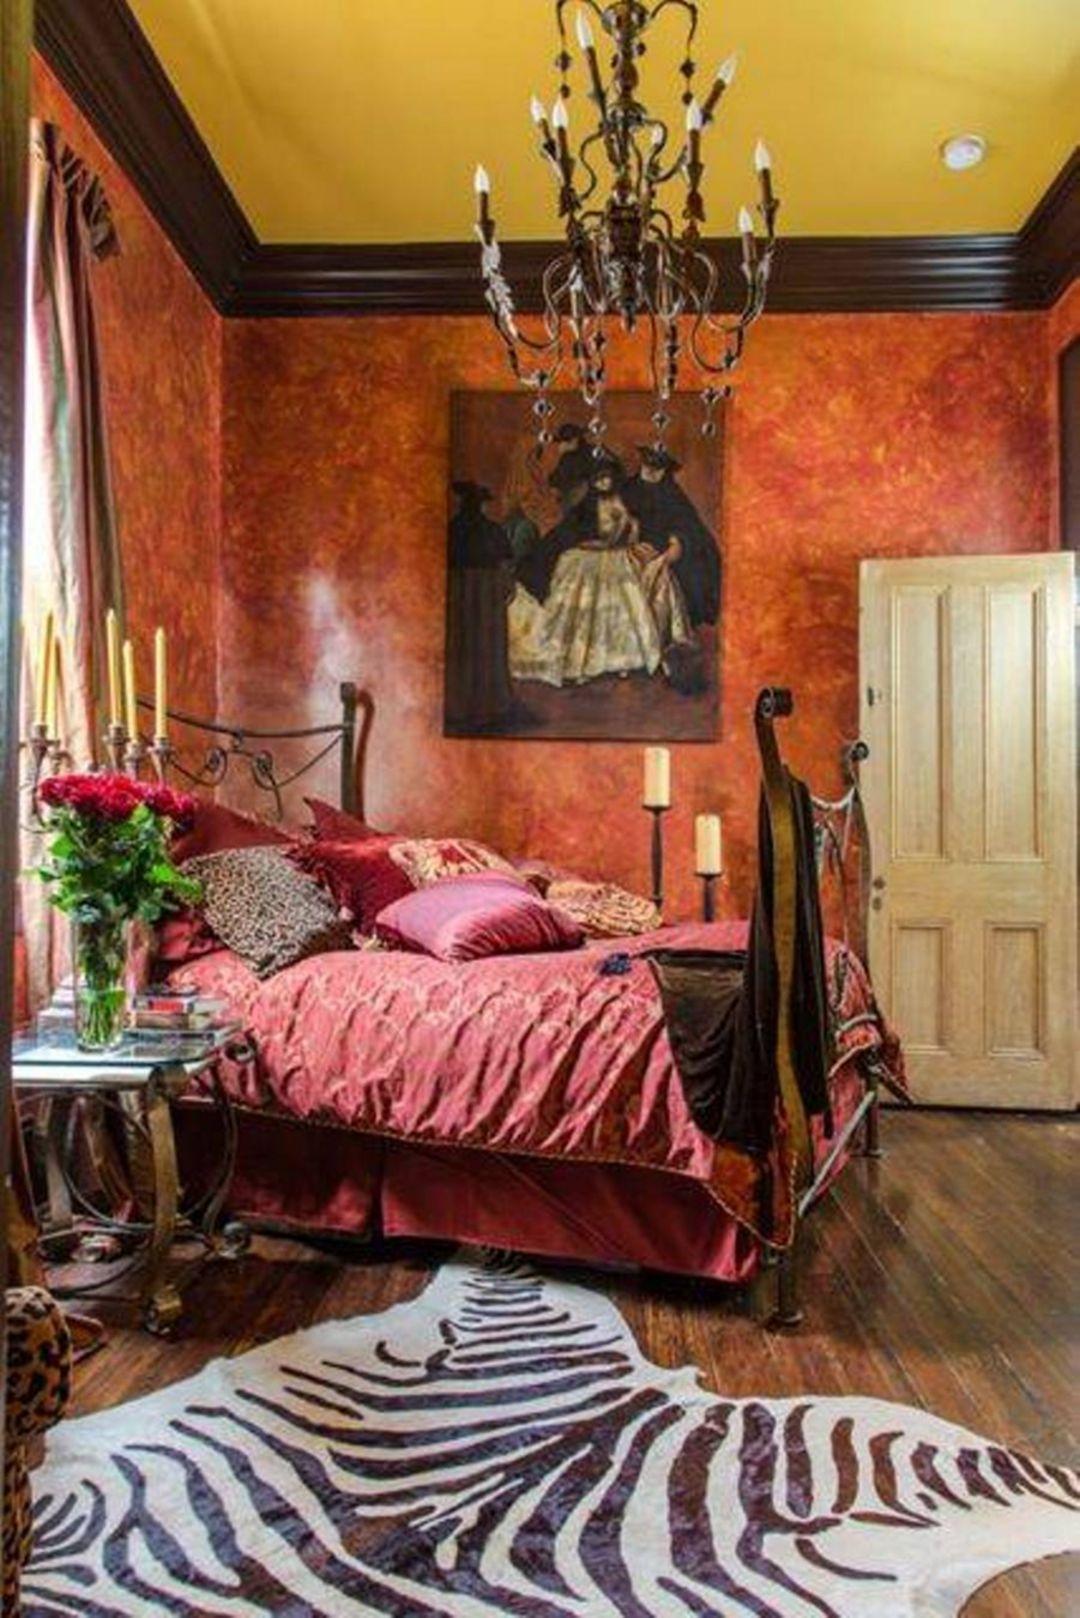 Estilo boho bohemian style bedrooms bohemian bedroom design modern bohemian bohemian bedroom